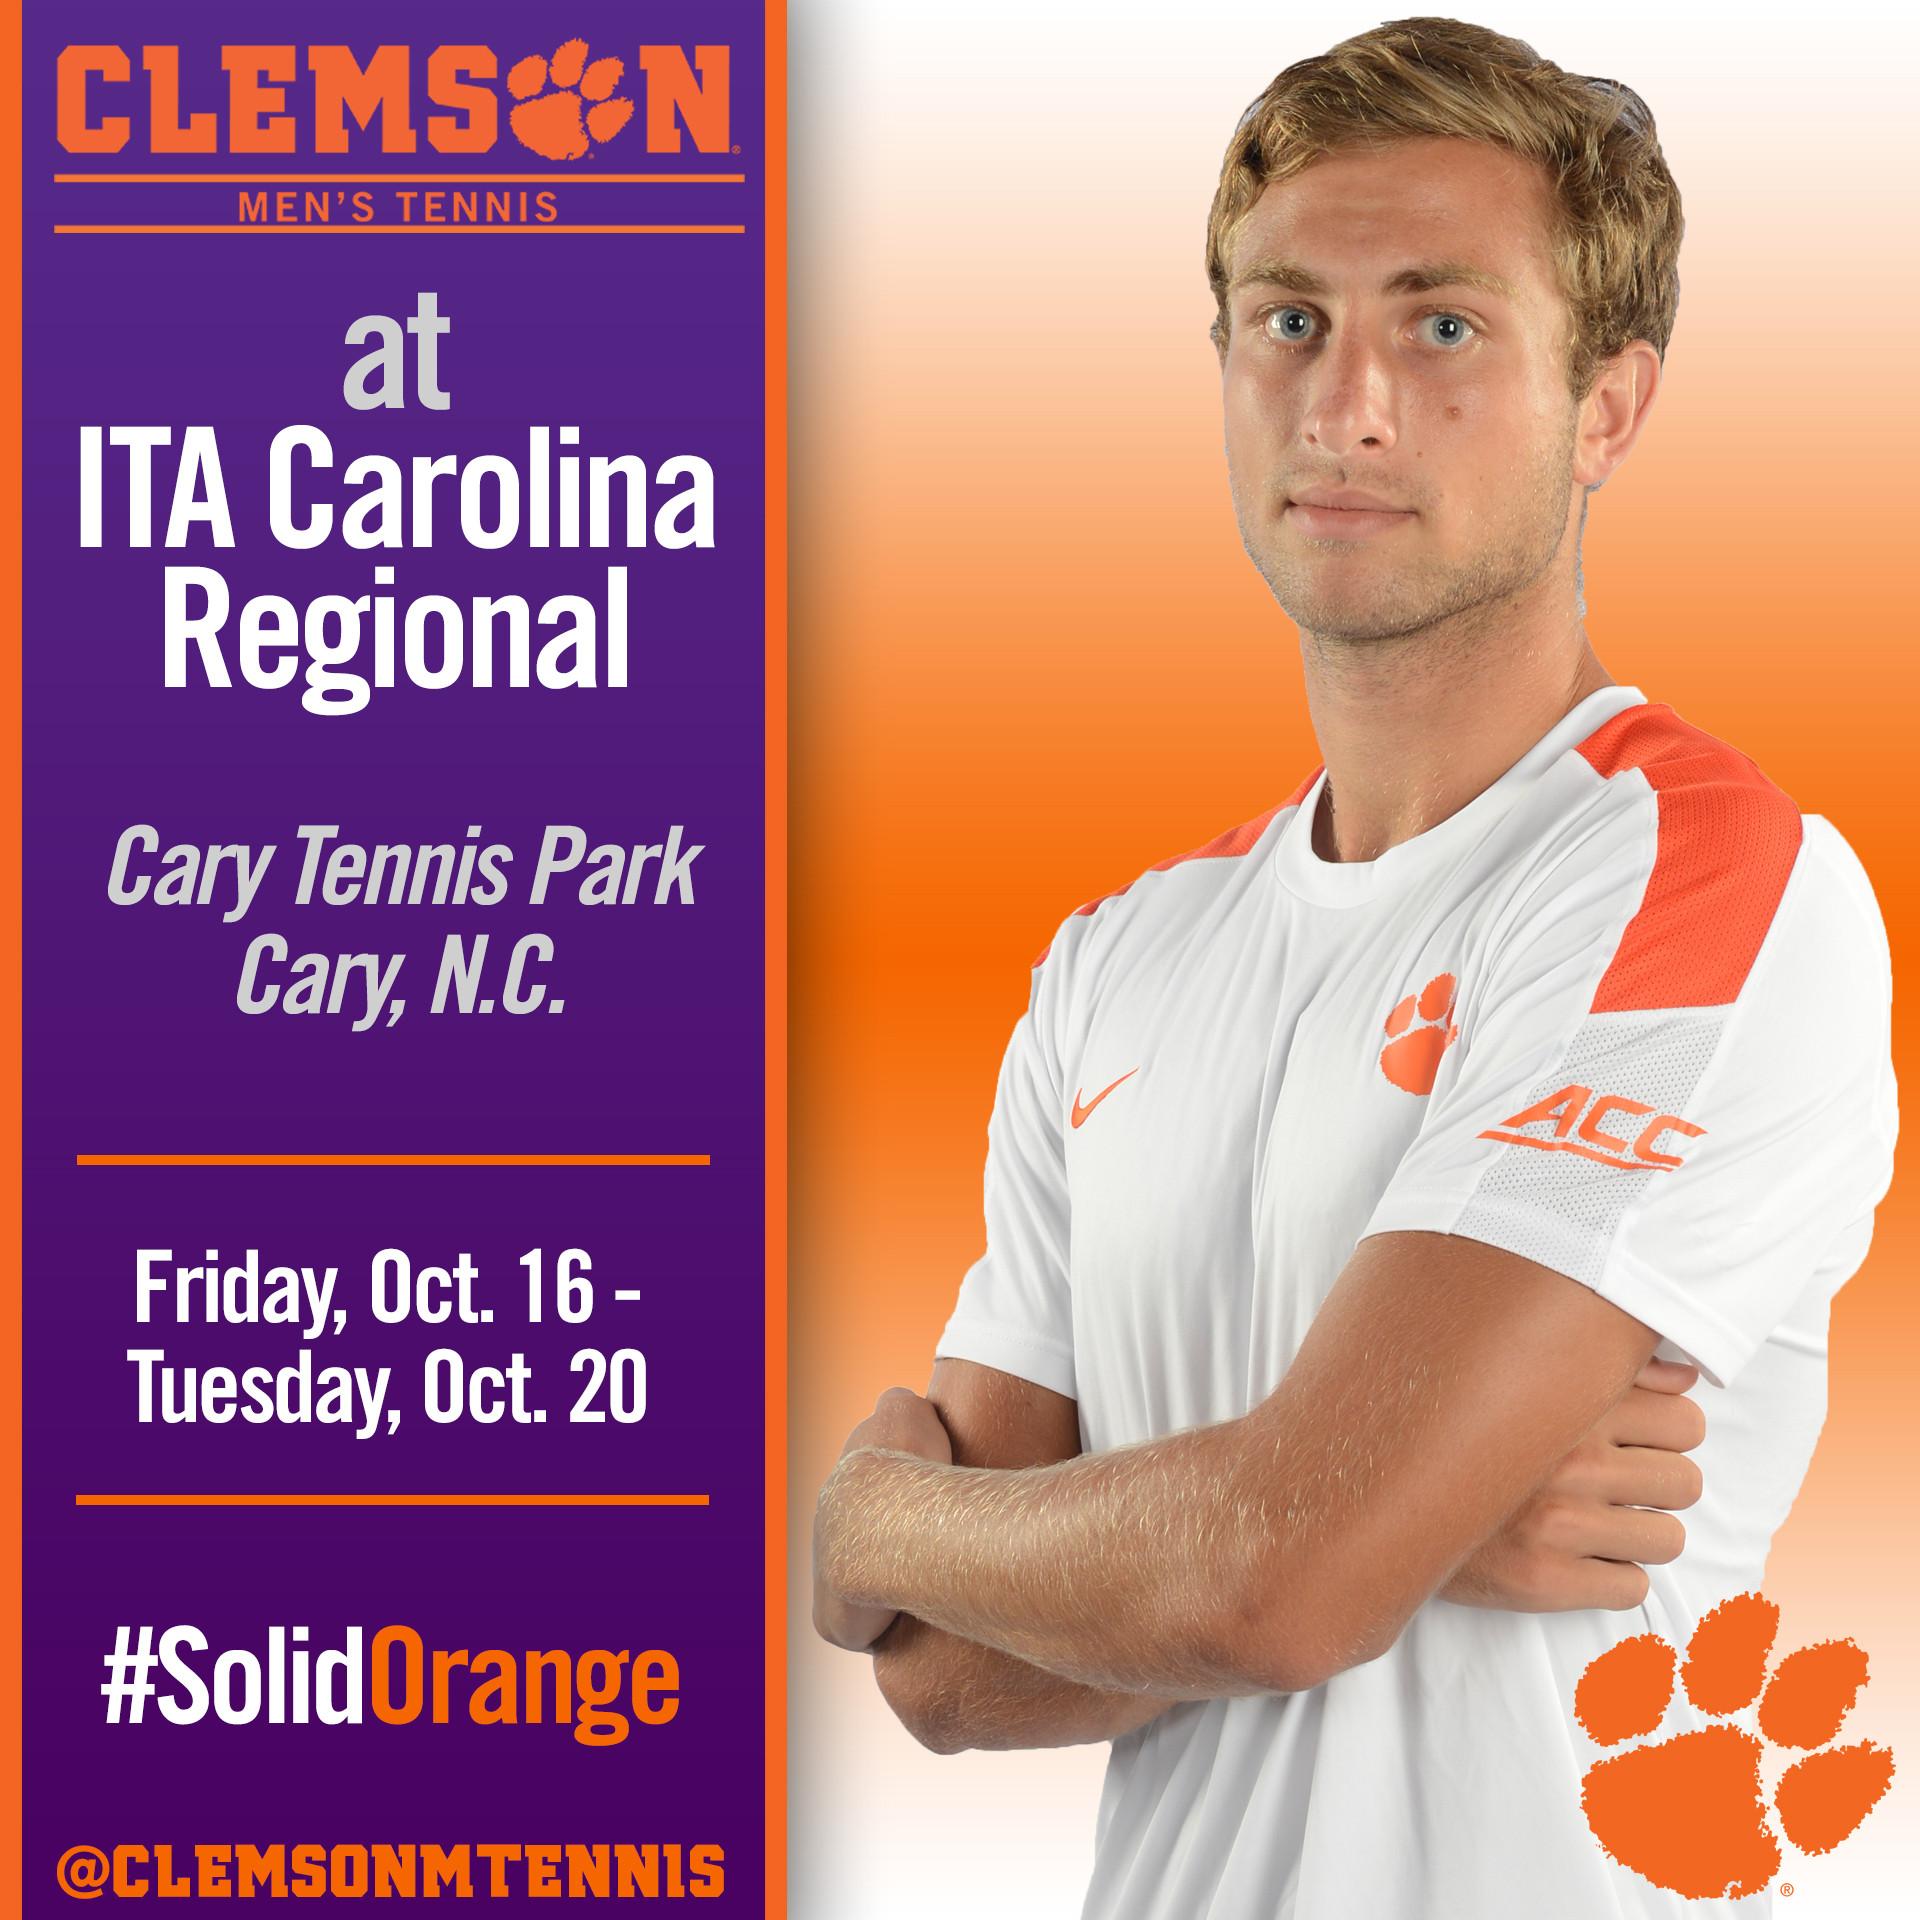 Tigers Open Play at ITA Carolina Regional Friday